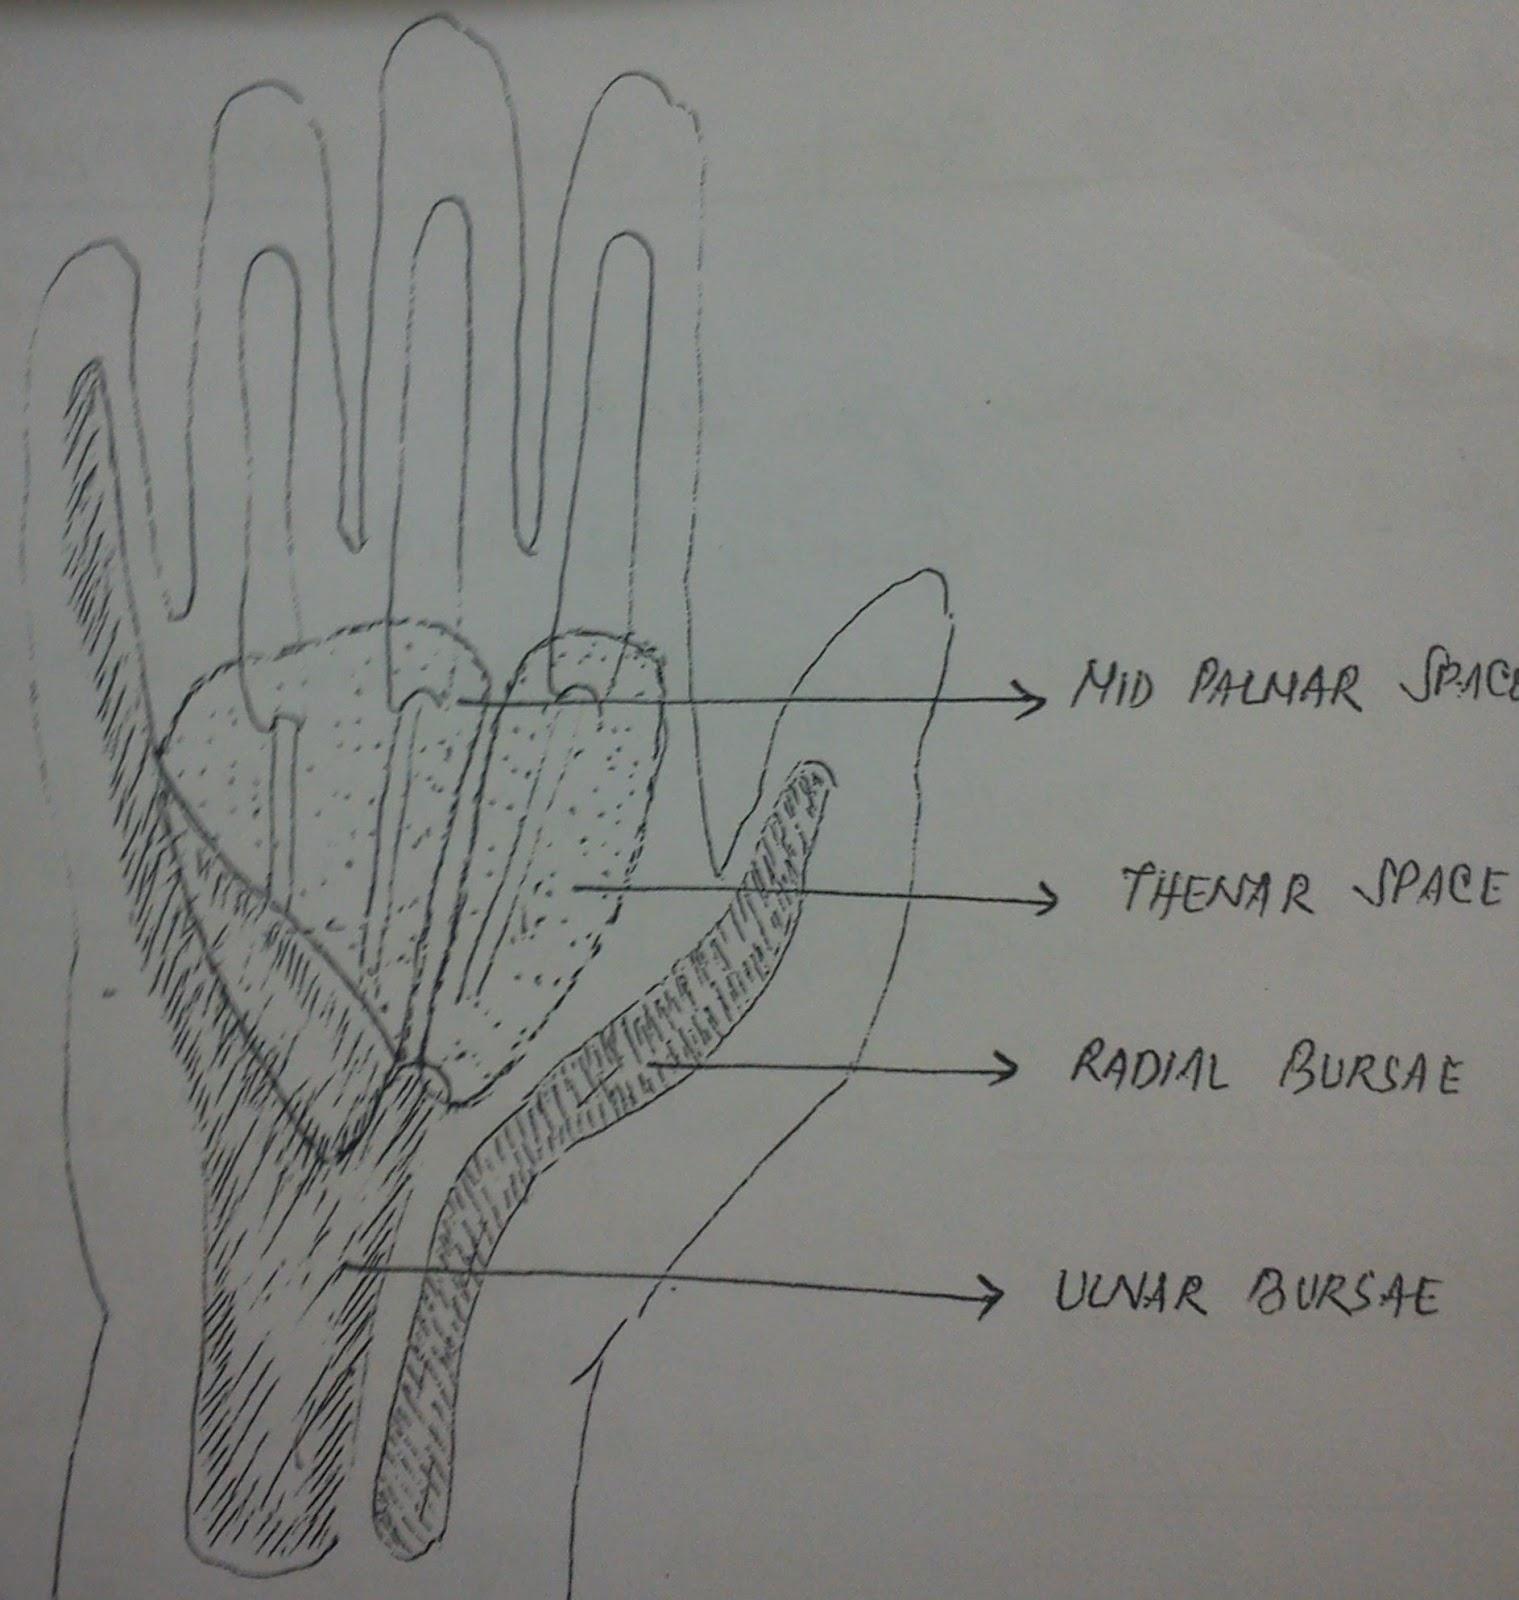 ANATOMY OF BURSAE AND SPACES IN HAND | bijopaul